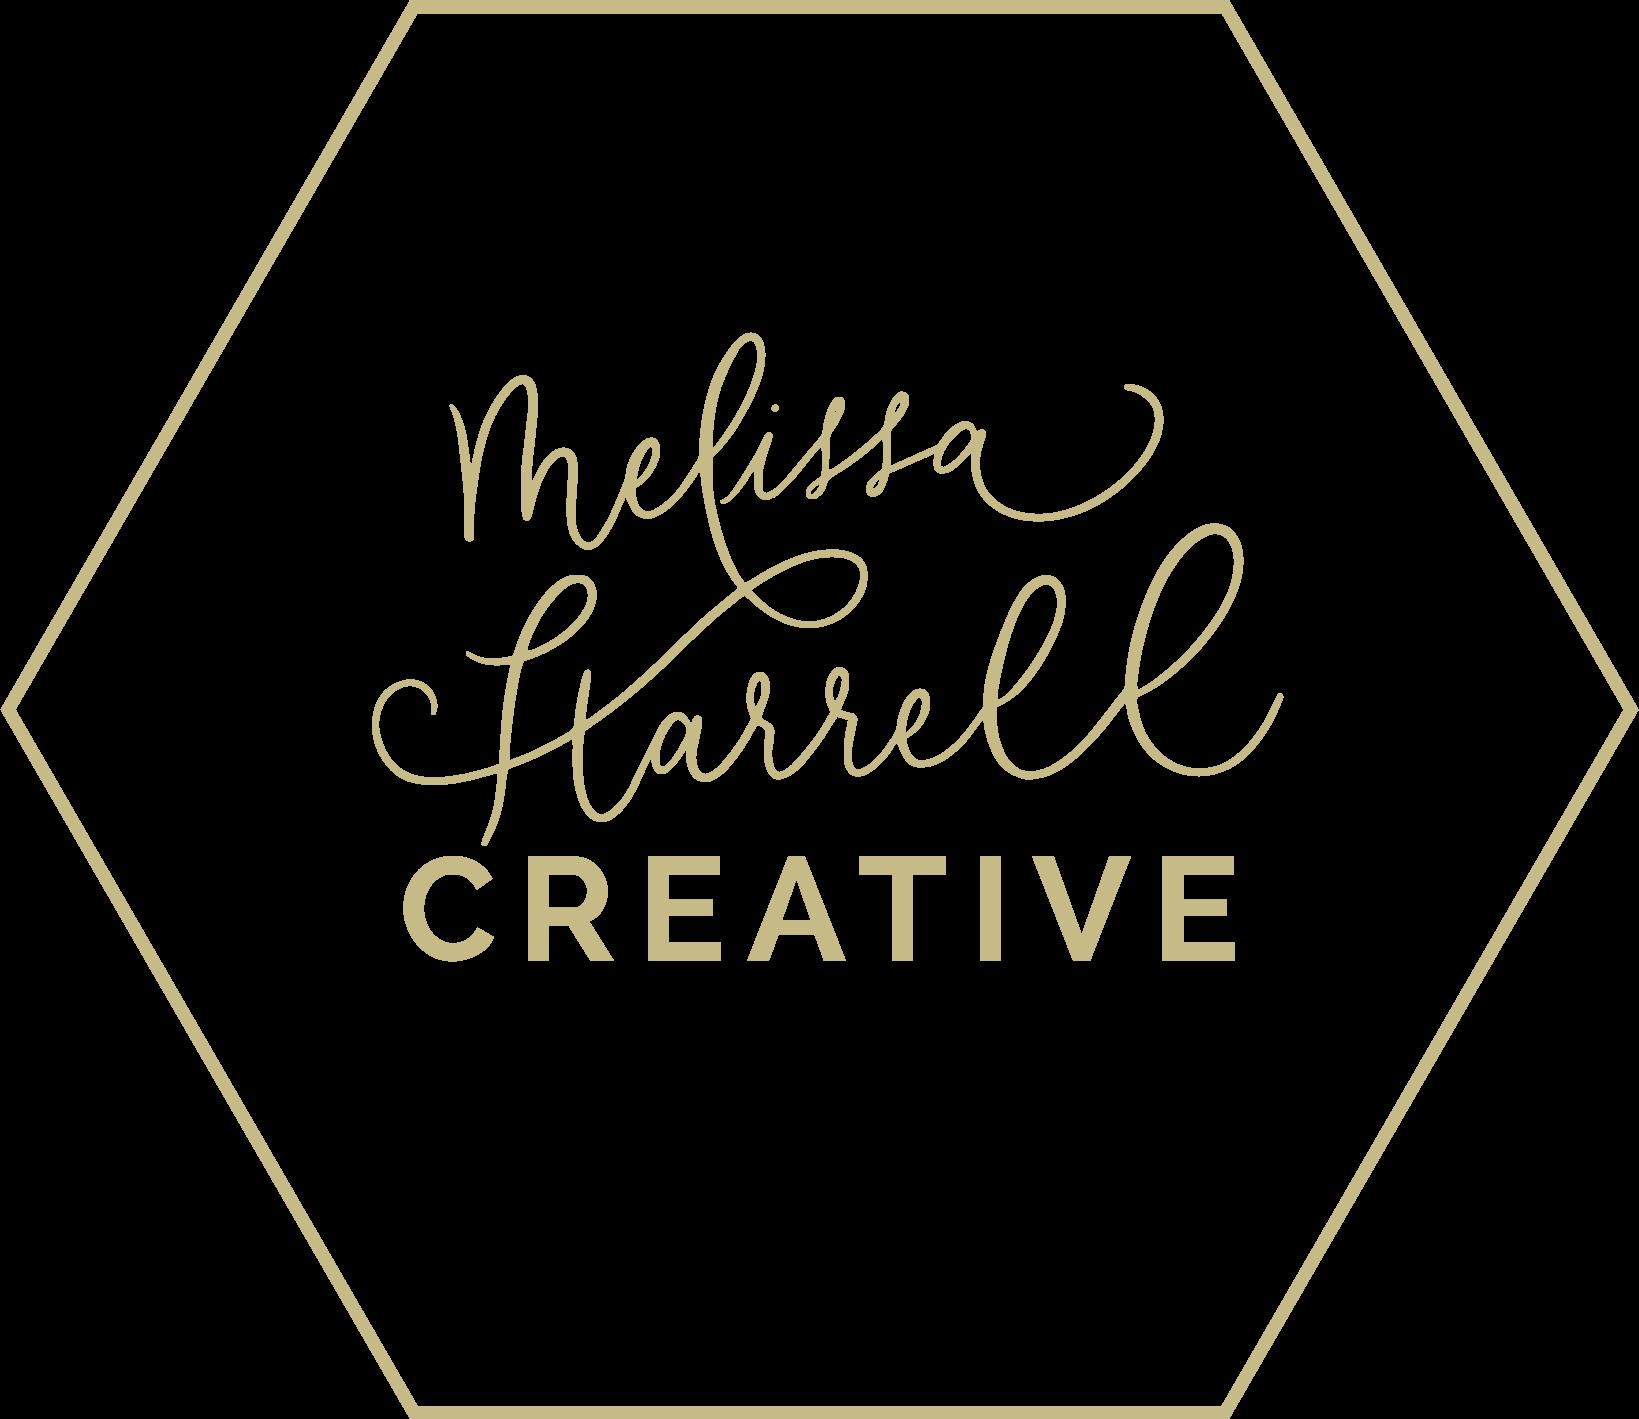 Melissa Harrell creative logo.png